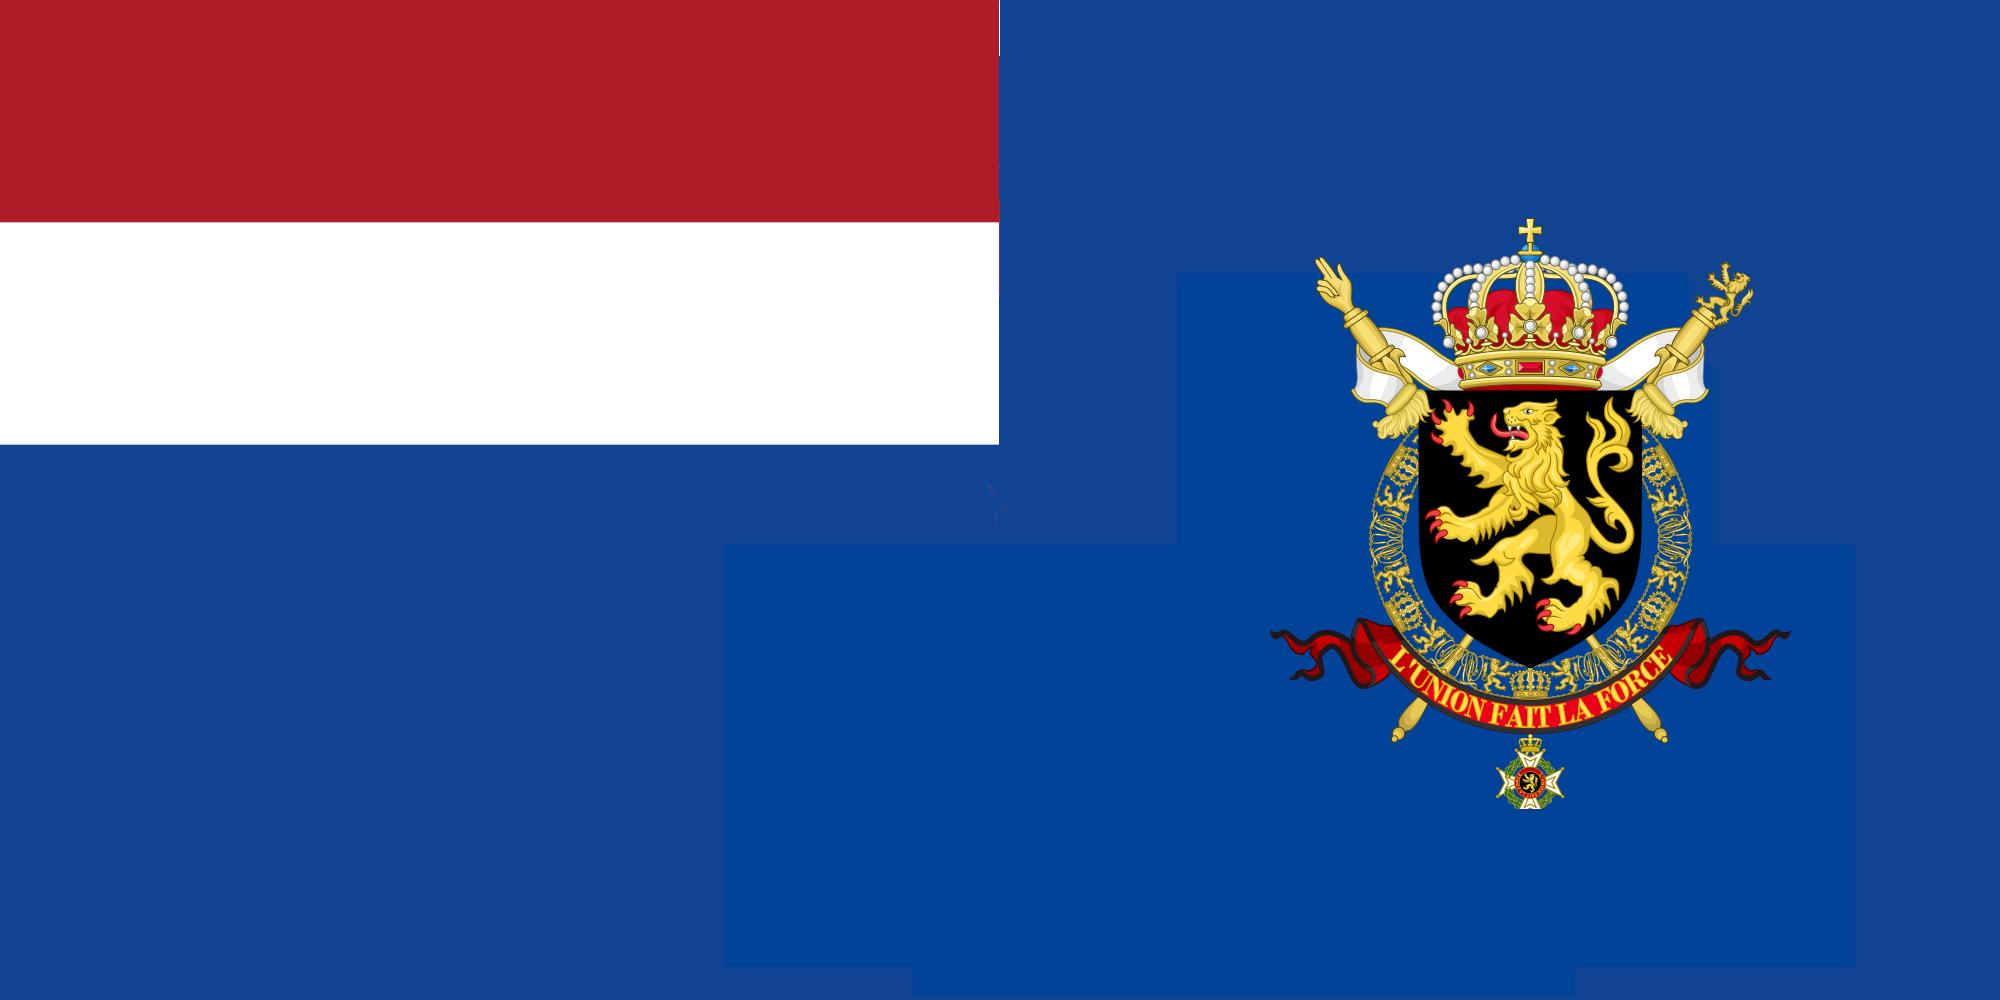 image flag of belgium notlah png alternative history